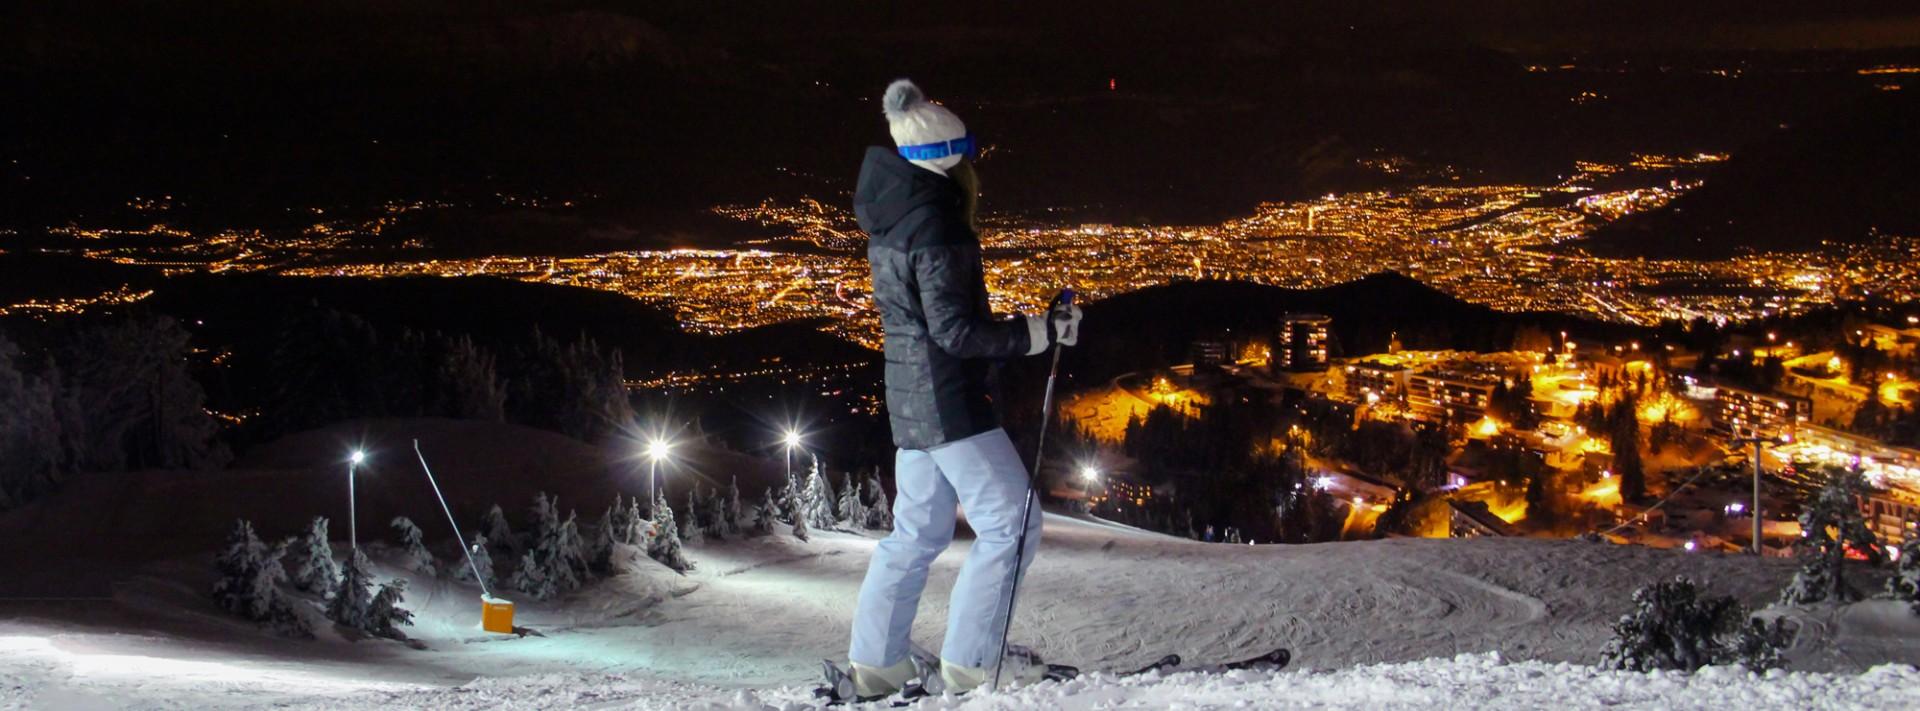 Ski nocturne Chamrousse